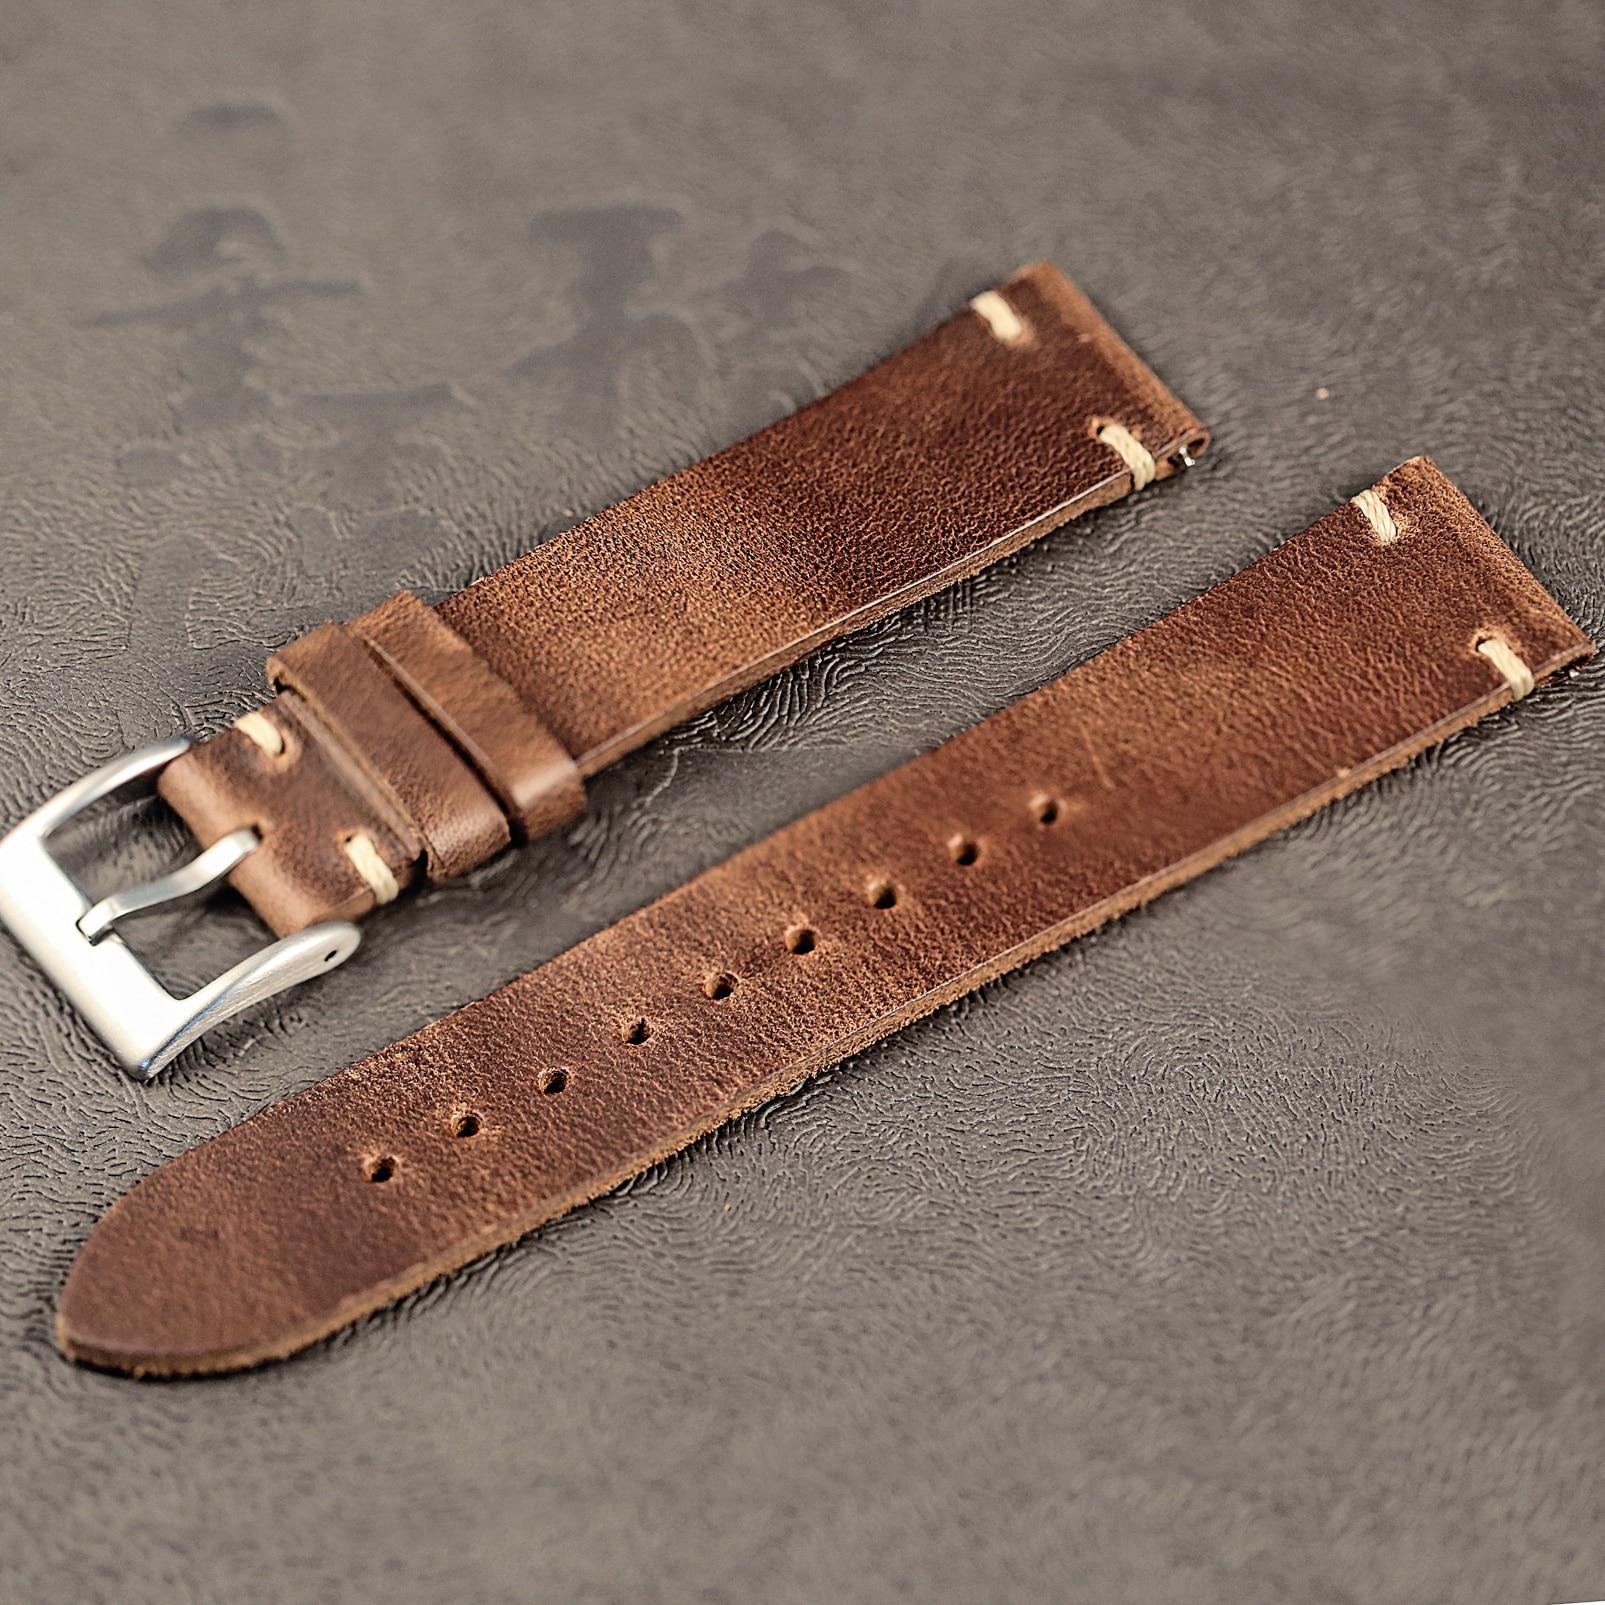 Horween chromexcel pulseiras de relógio couro natural 100% cintas de couro artesanais 18mm 20mm 22mm